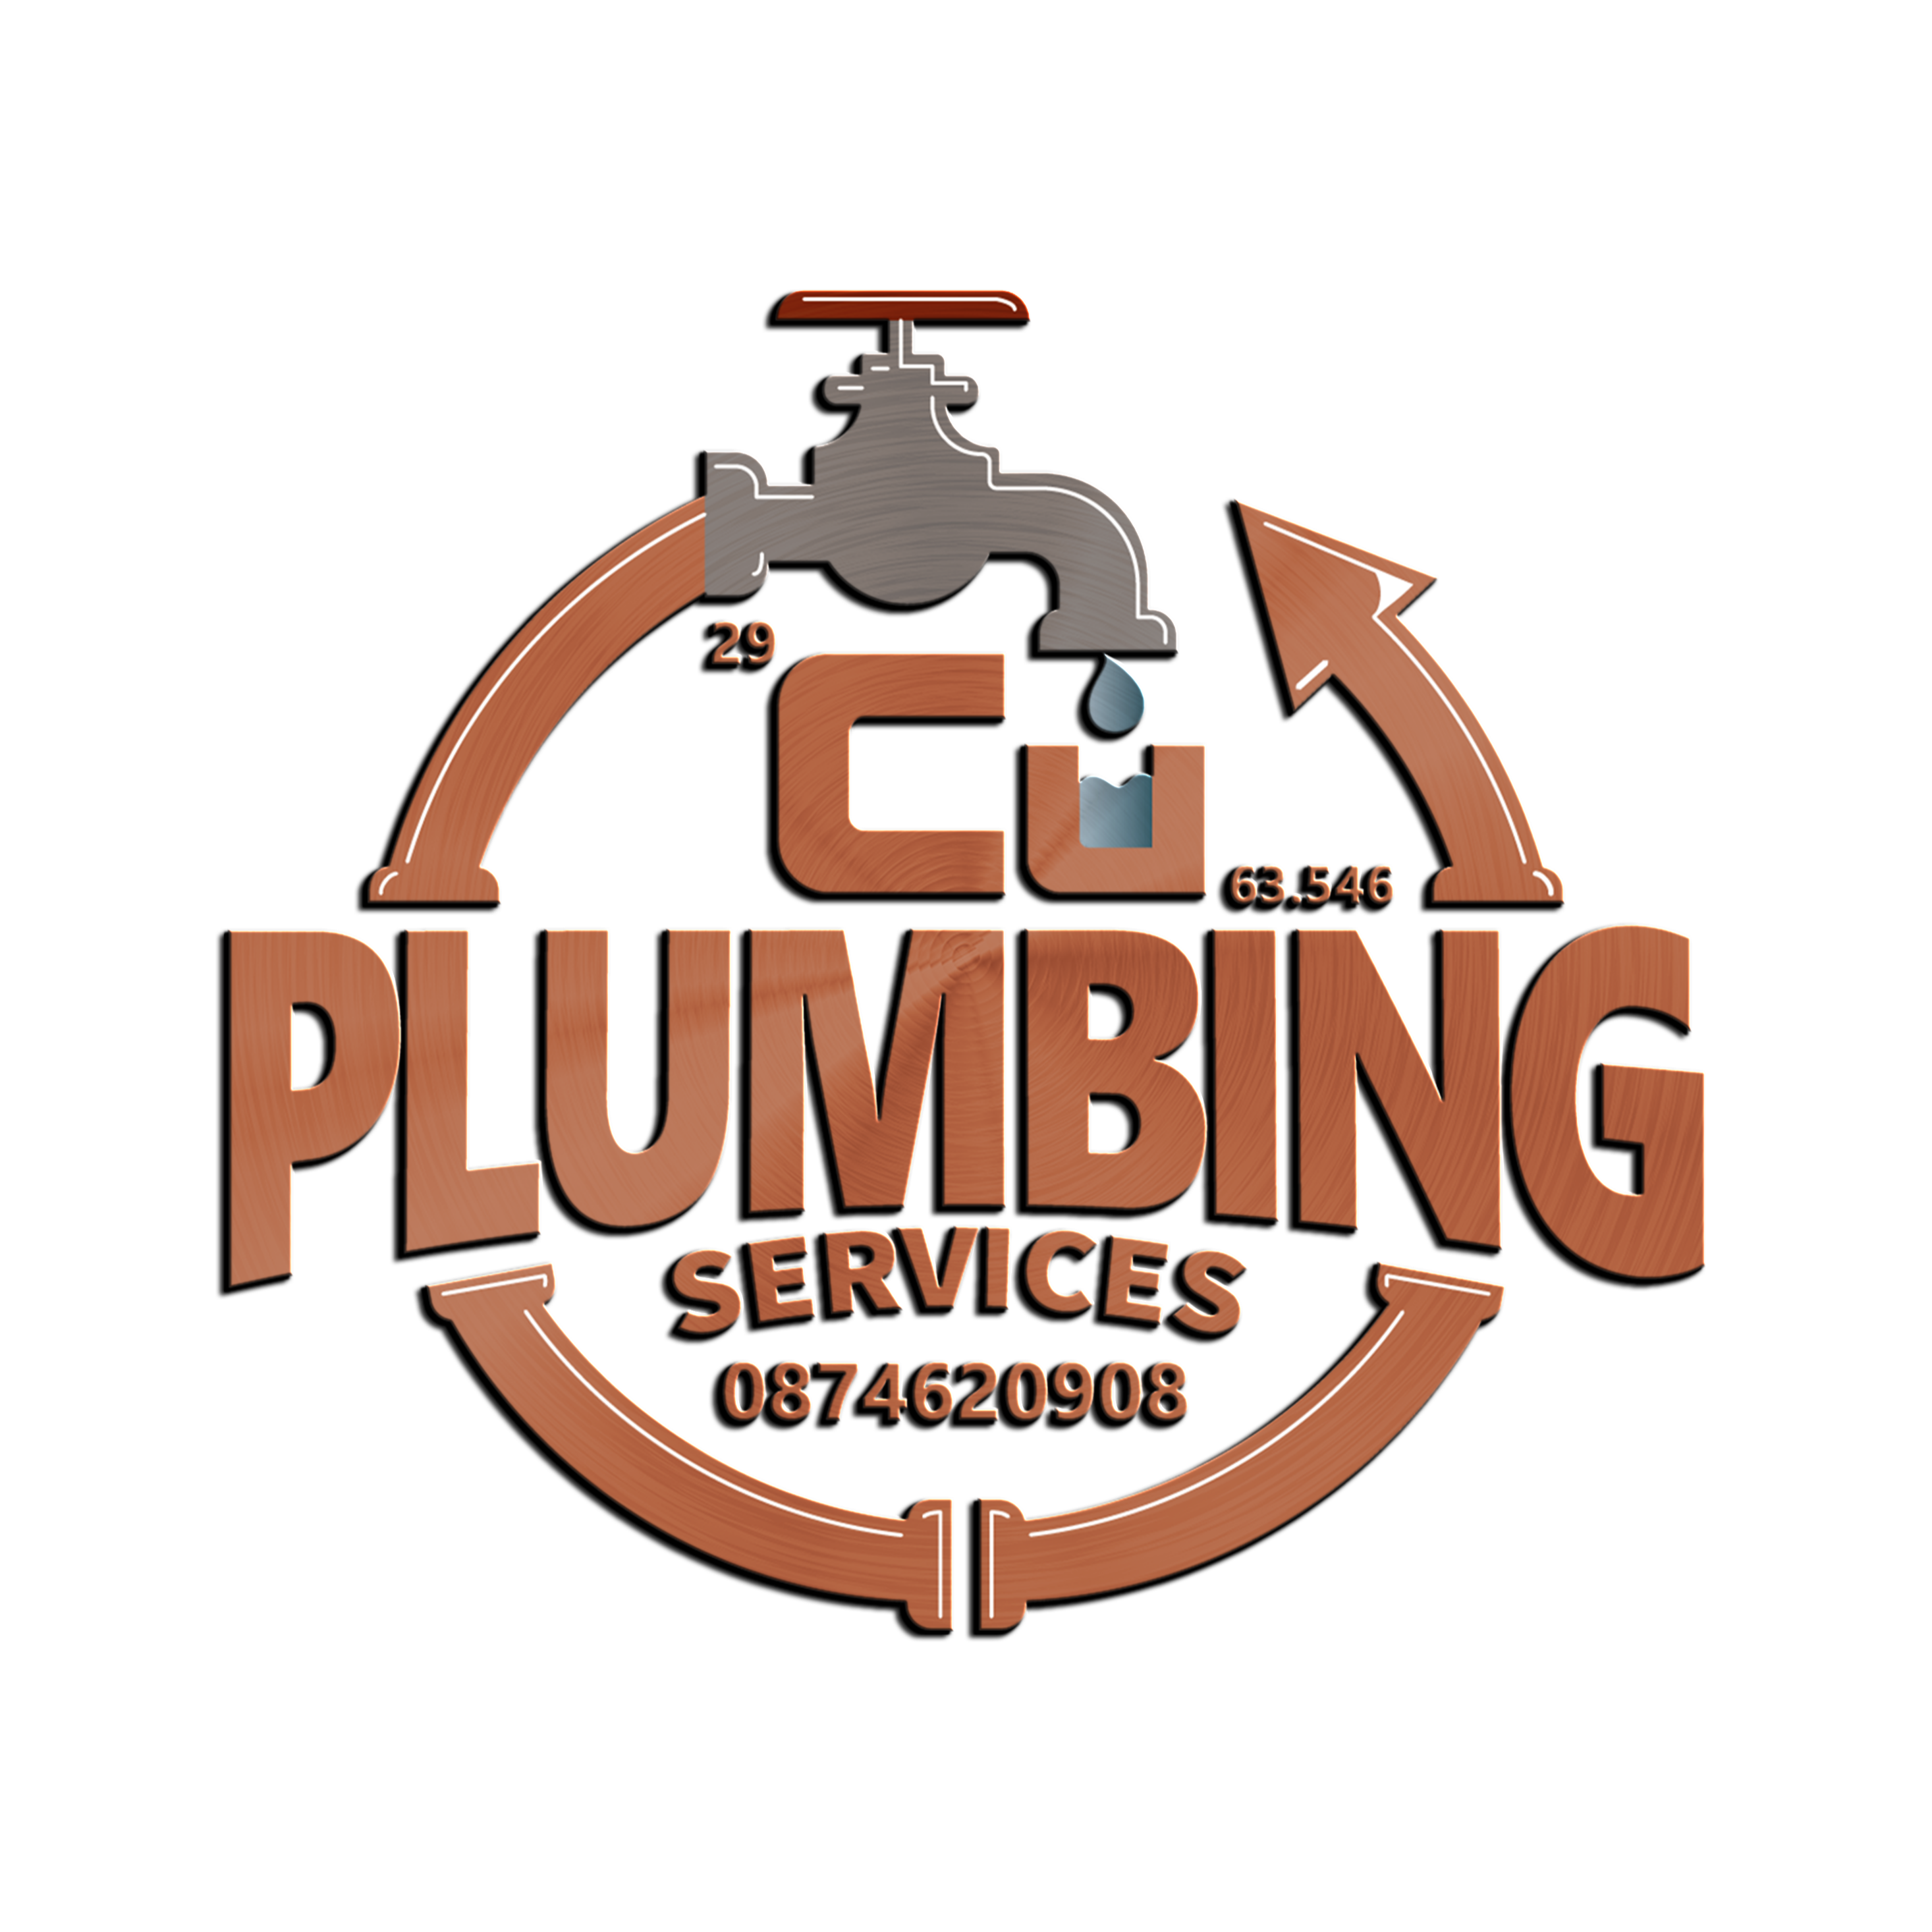 Cu Plumbing Services